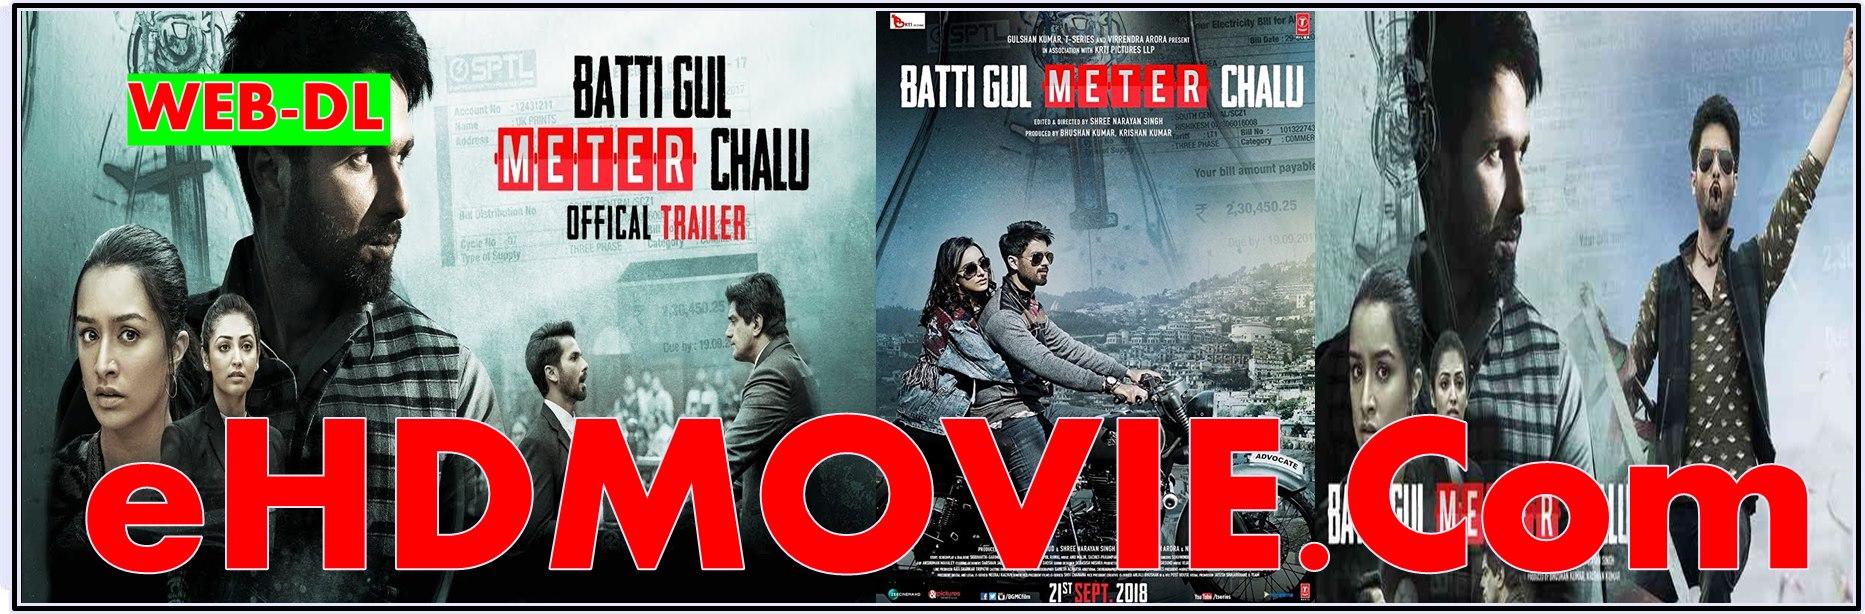 Batti Gul Meter Chalu 2018 Full Movie Hindi 1080p - 720p - HEVC - 480p ORG WEB-DL 400MB - 700MB - 1.6GB - 8GB ESubs Free Download